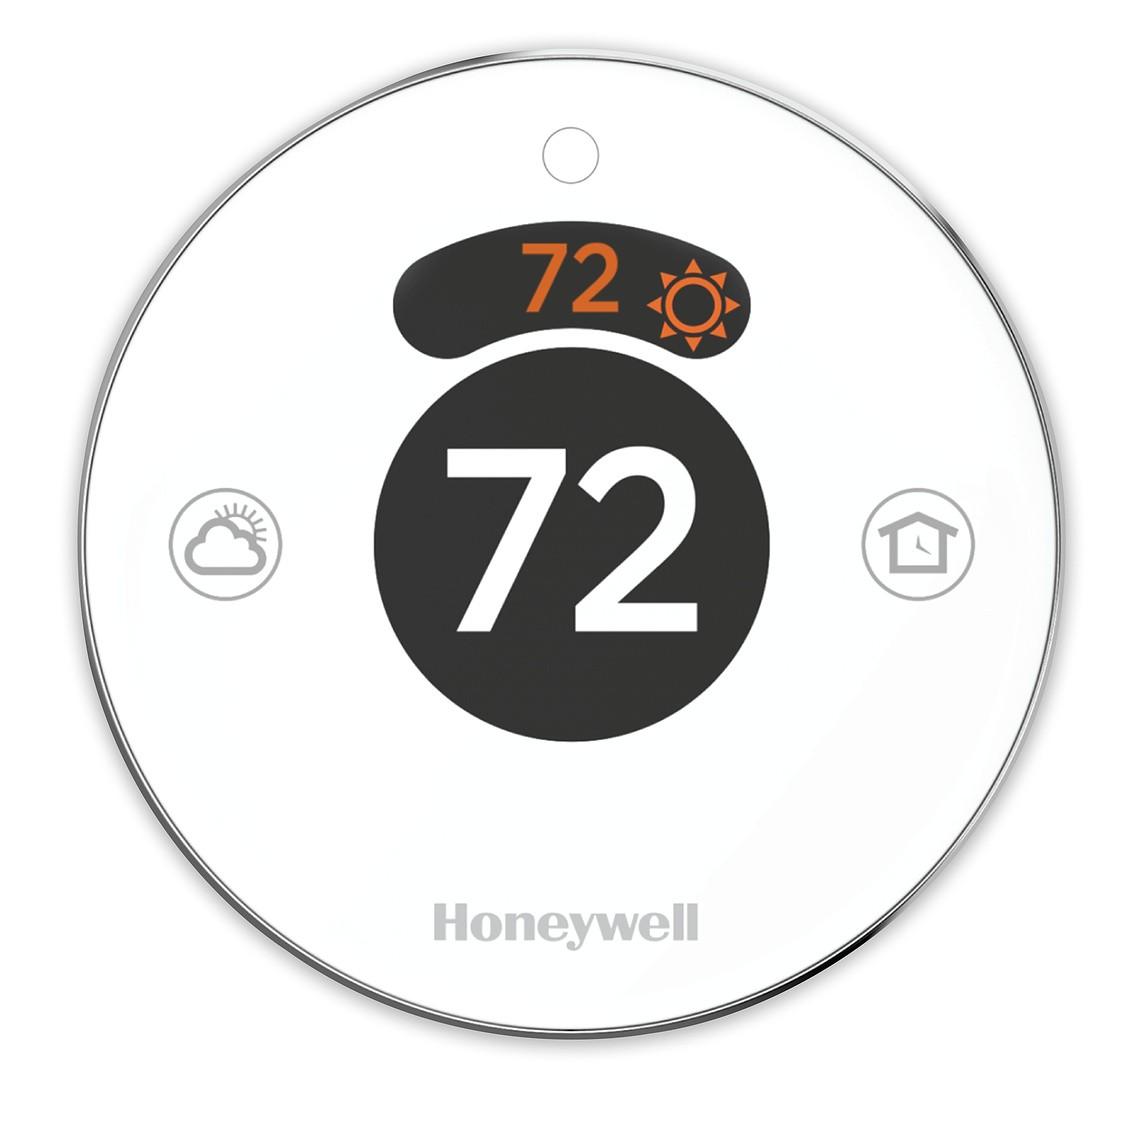 honeywell lyric thermostat wiring diagram how to install the honeywell lyric thermostat hvac com  install the honeywell lyric thermostat